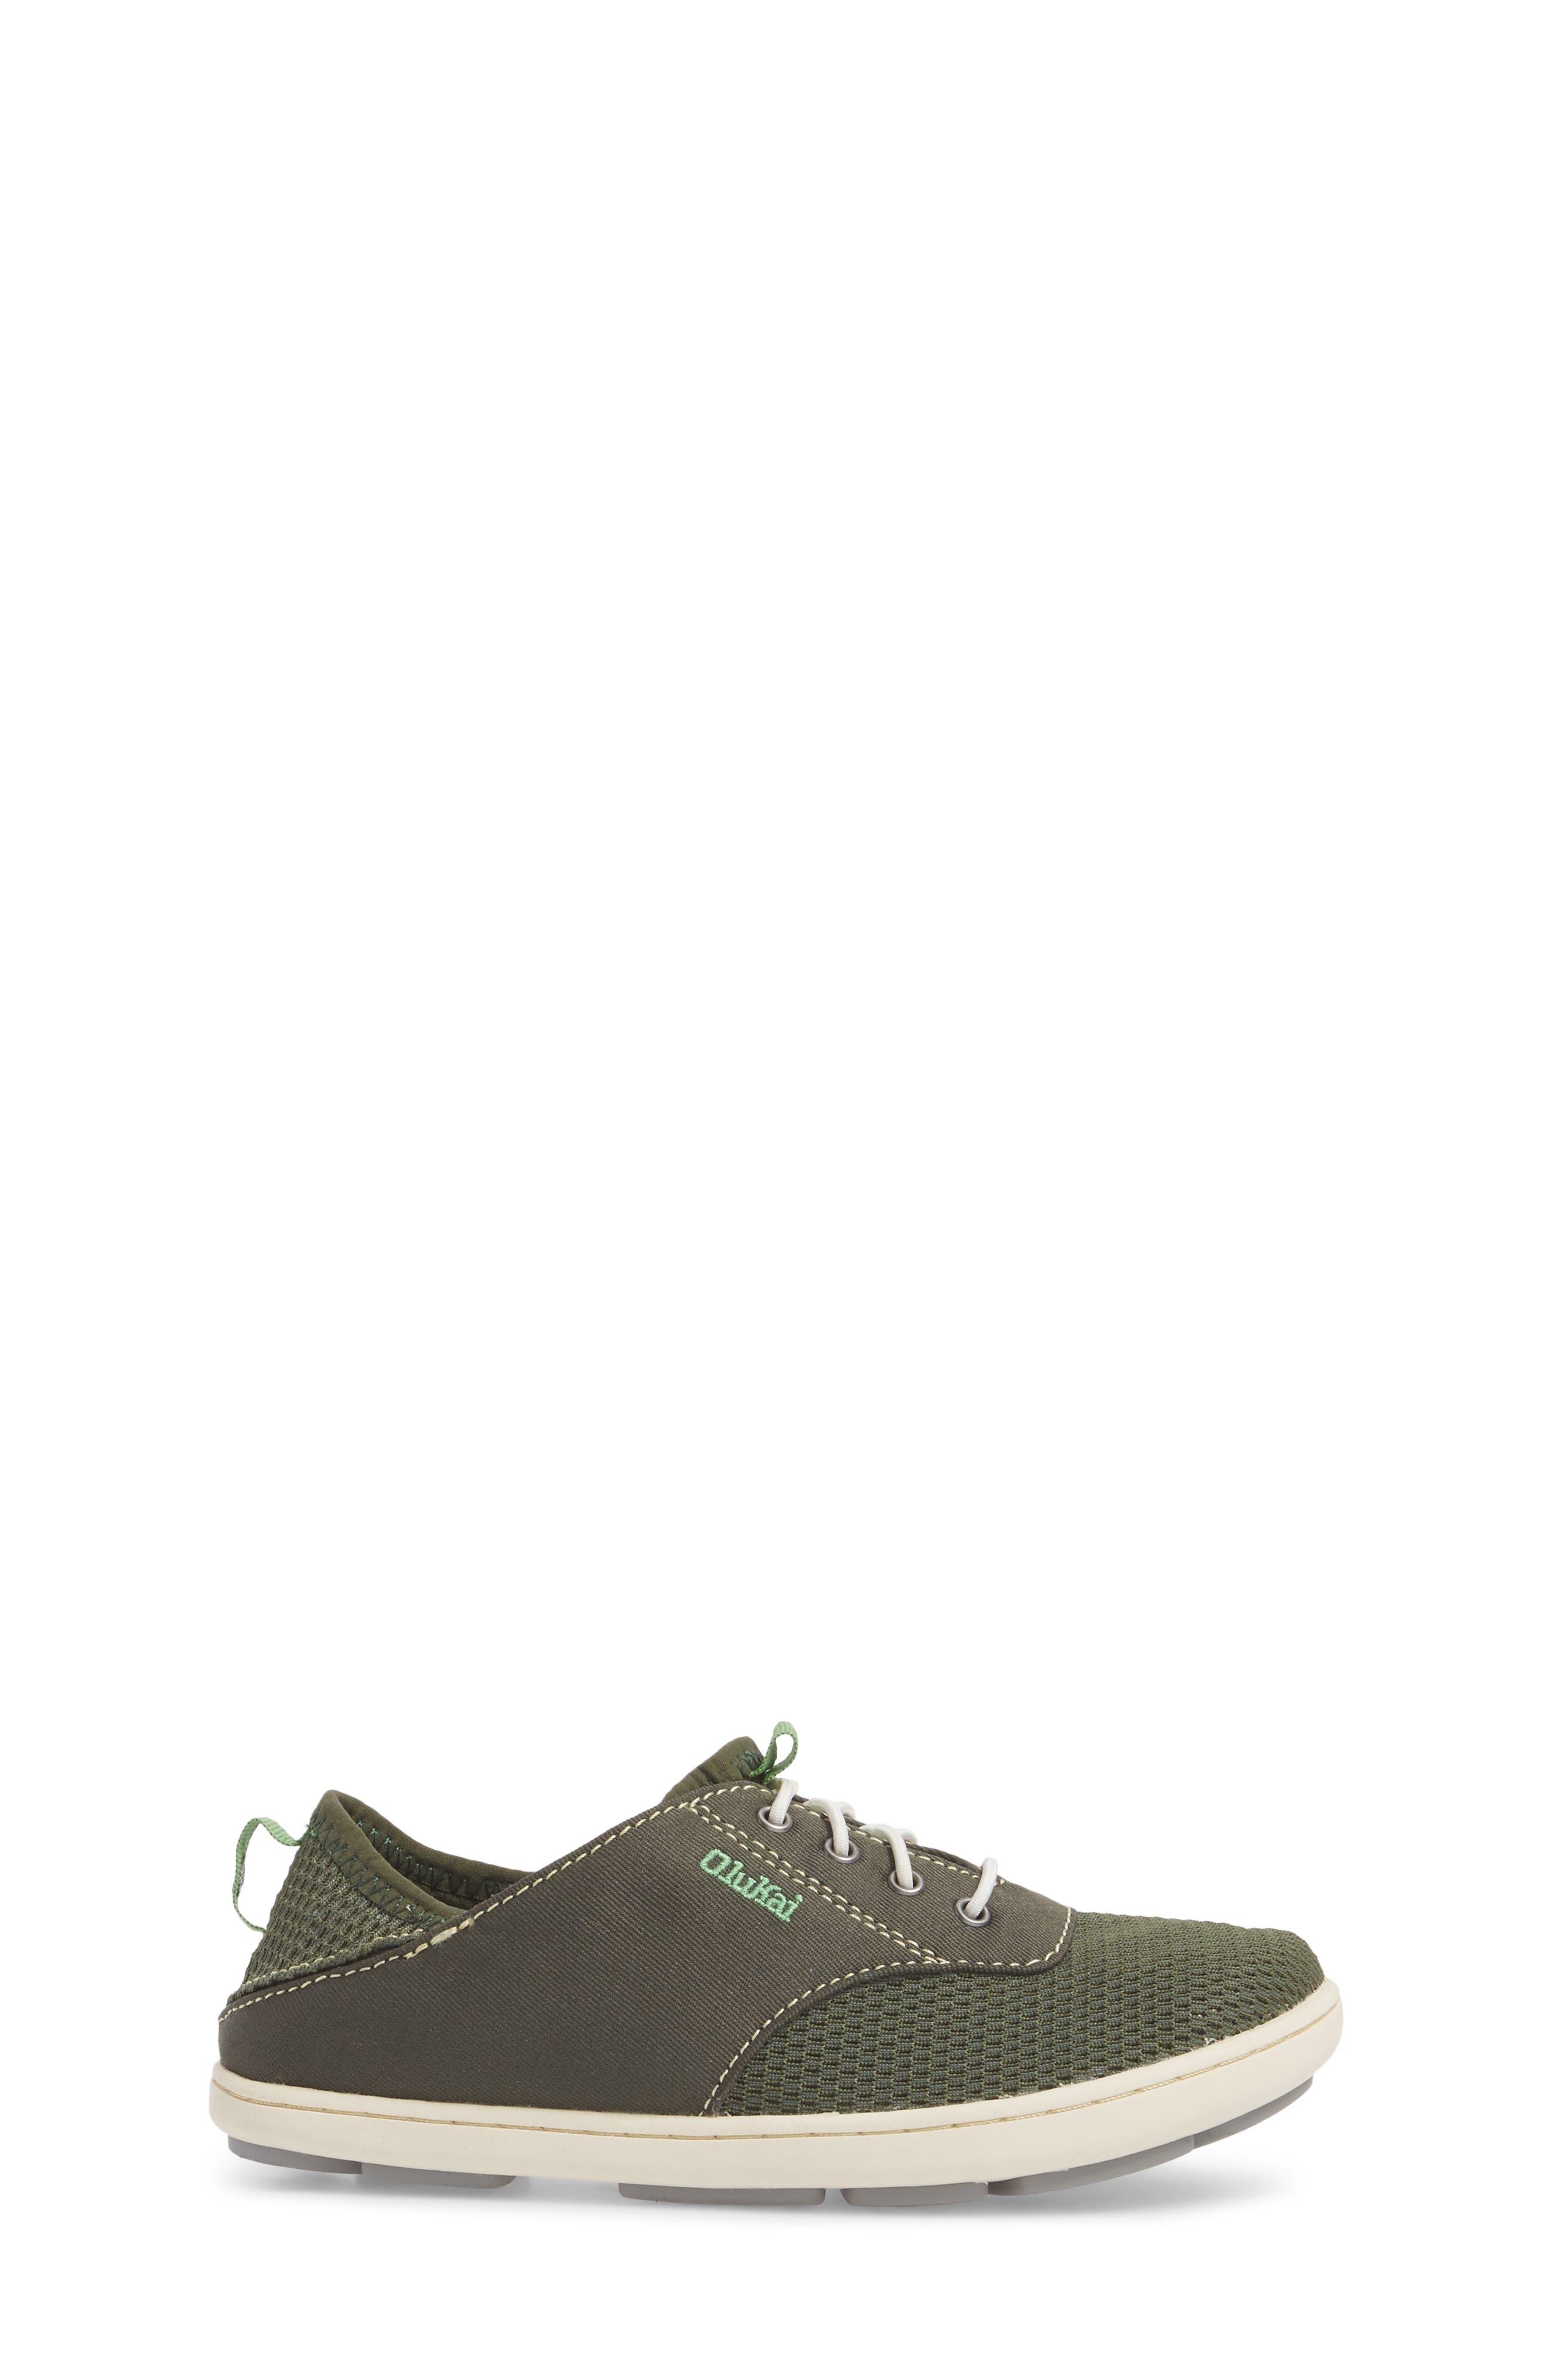 OLUKAI, Nohea Moku Water Resistant Shoe, Alternate thumbnail 2, color, SEA GRASS/ SEA GRASS